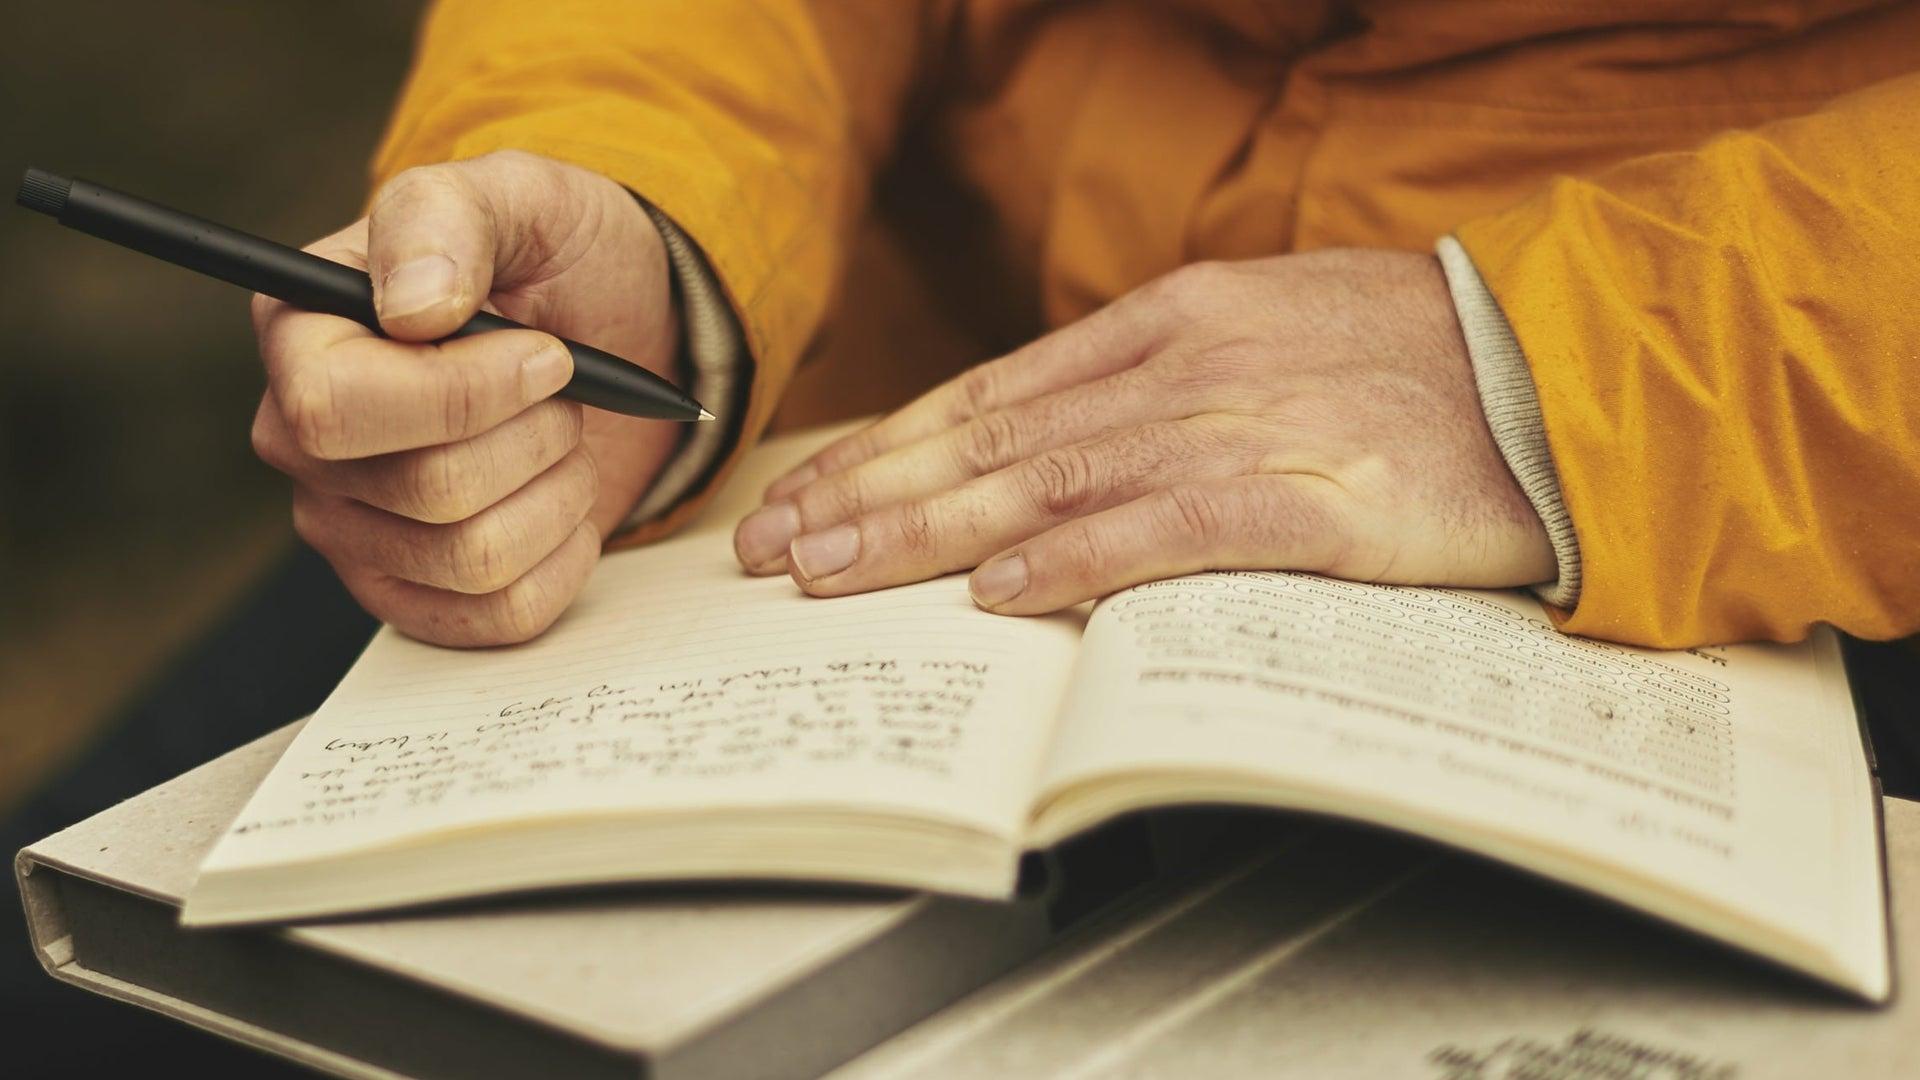 journal-handwriting-pen.jpg